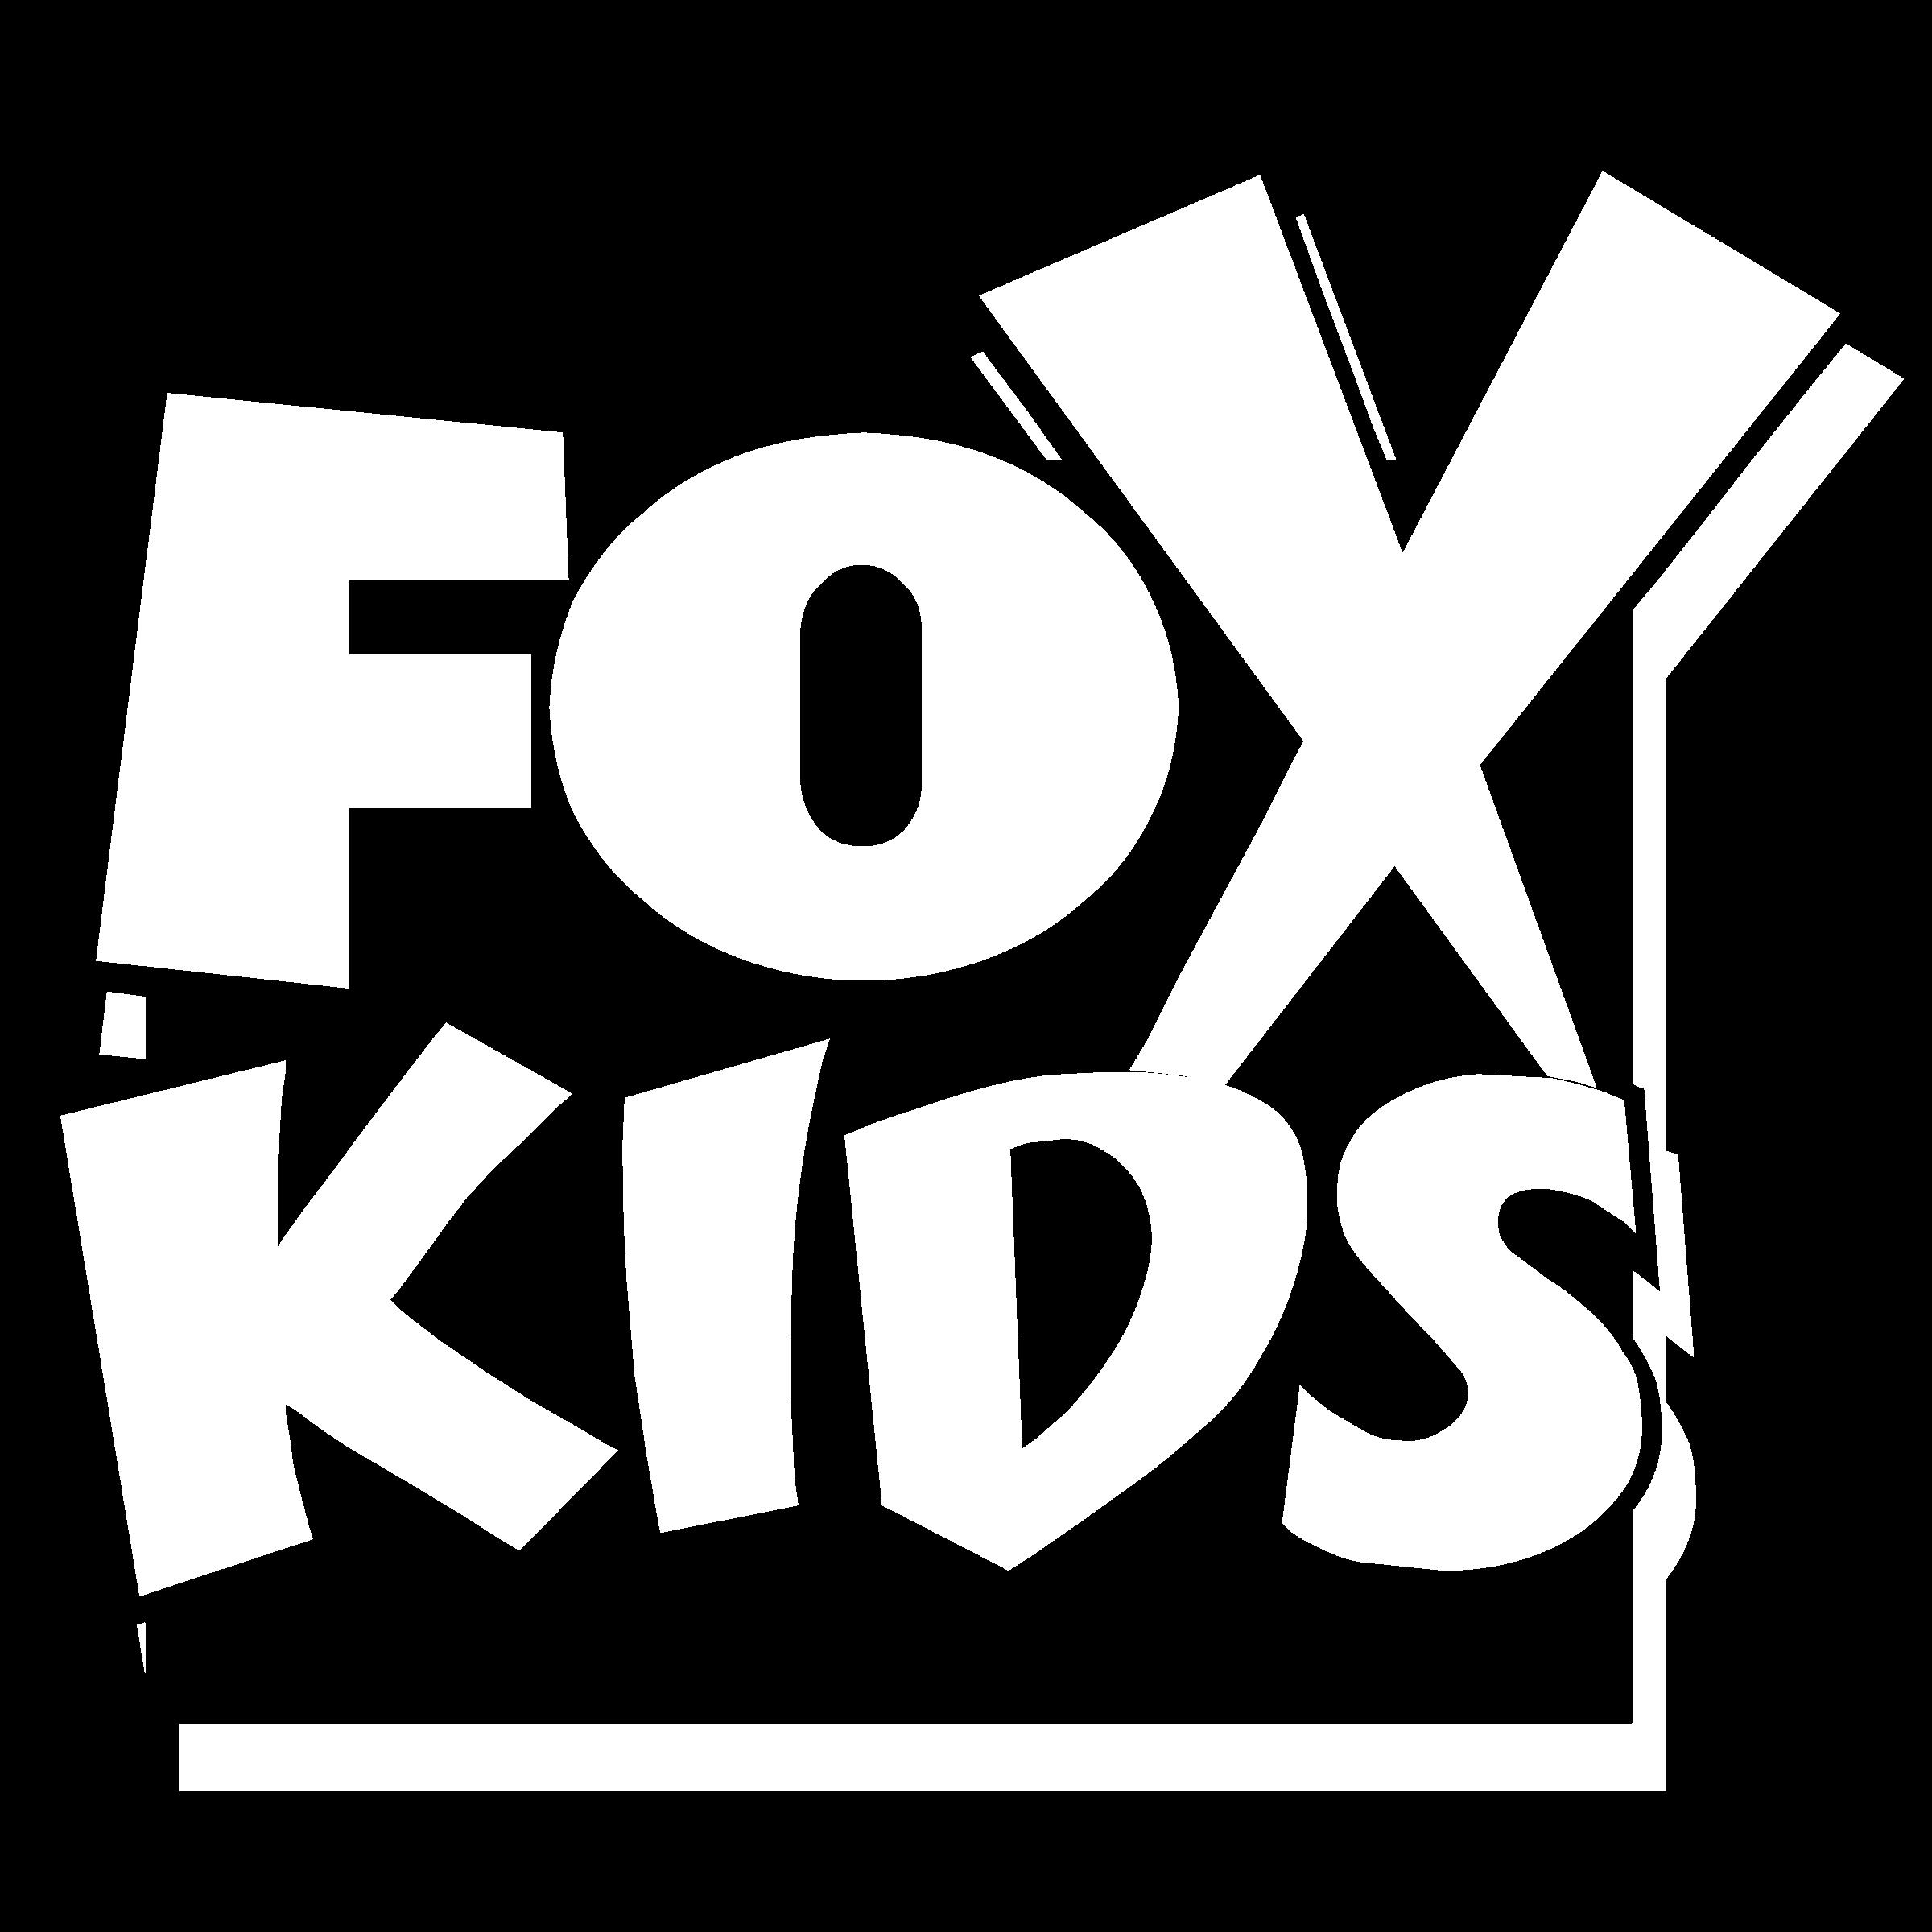 FoxKids Logo PNG Transparent & SVG Vector